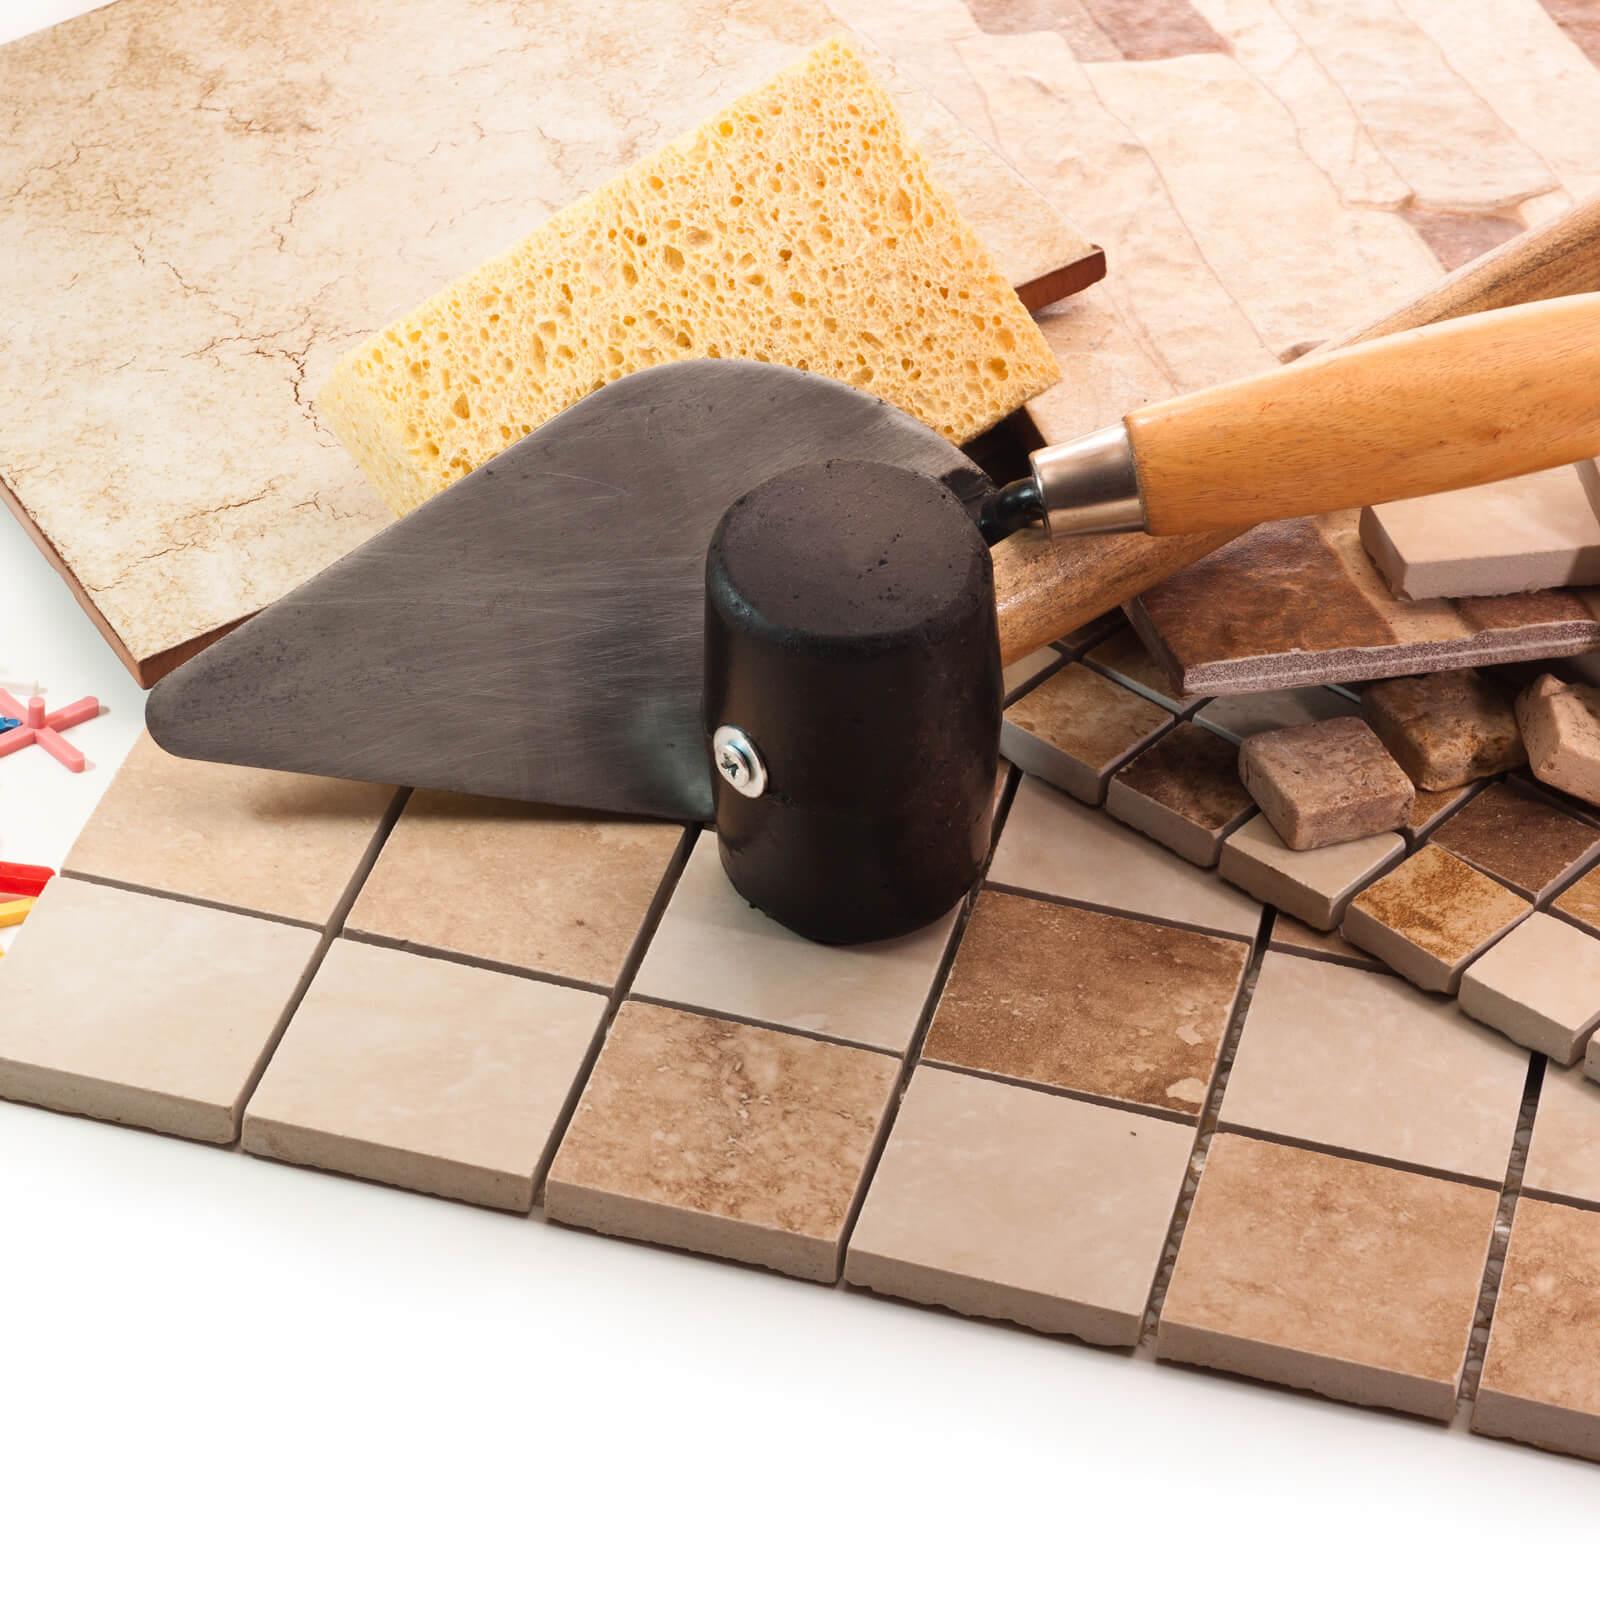 Tile installation | Vic's Carpet & Flooring